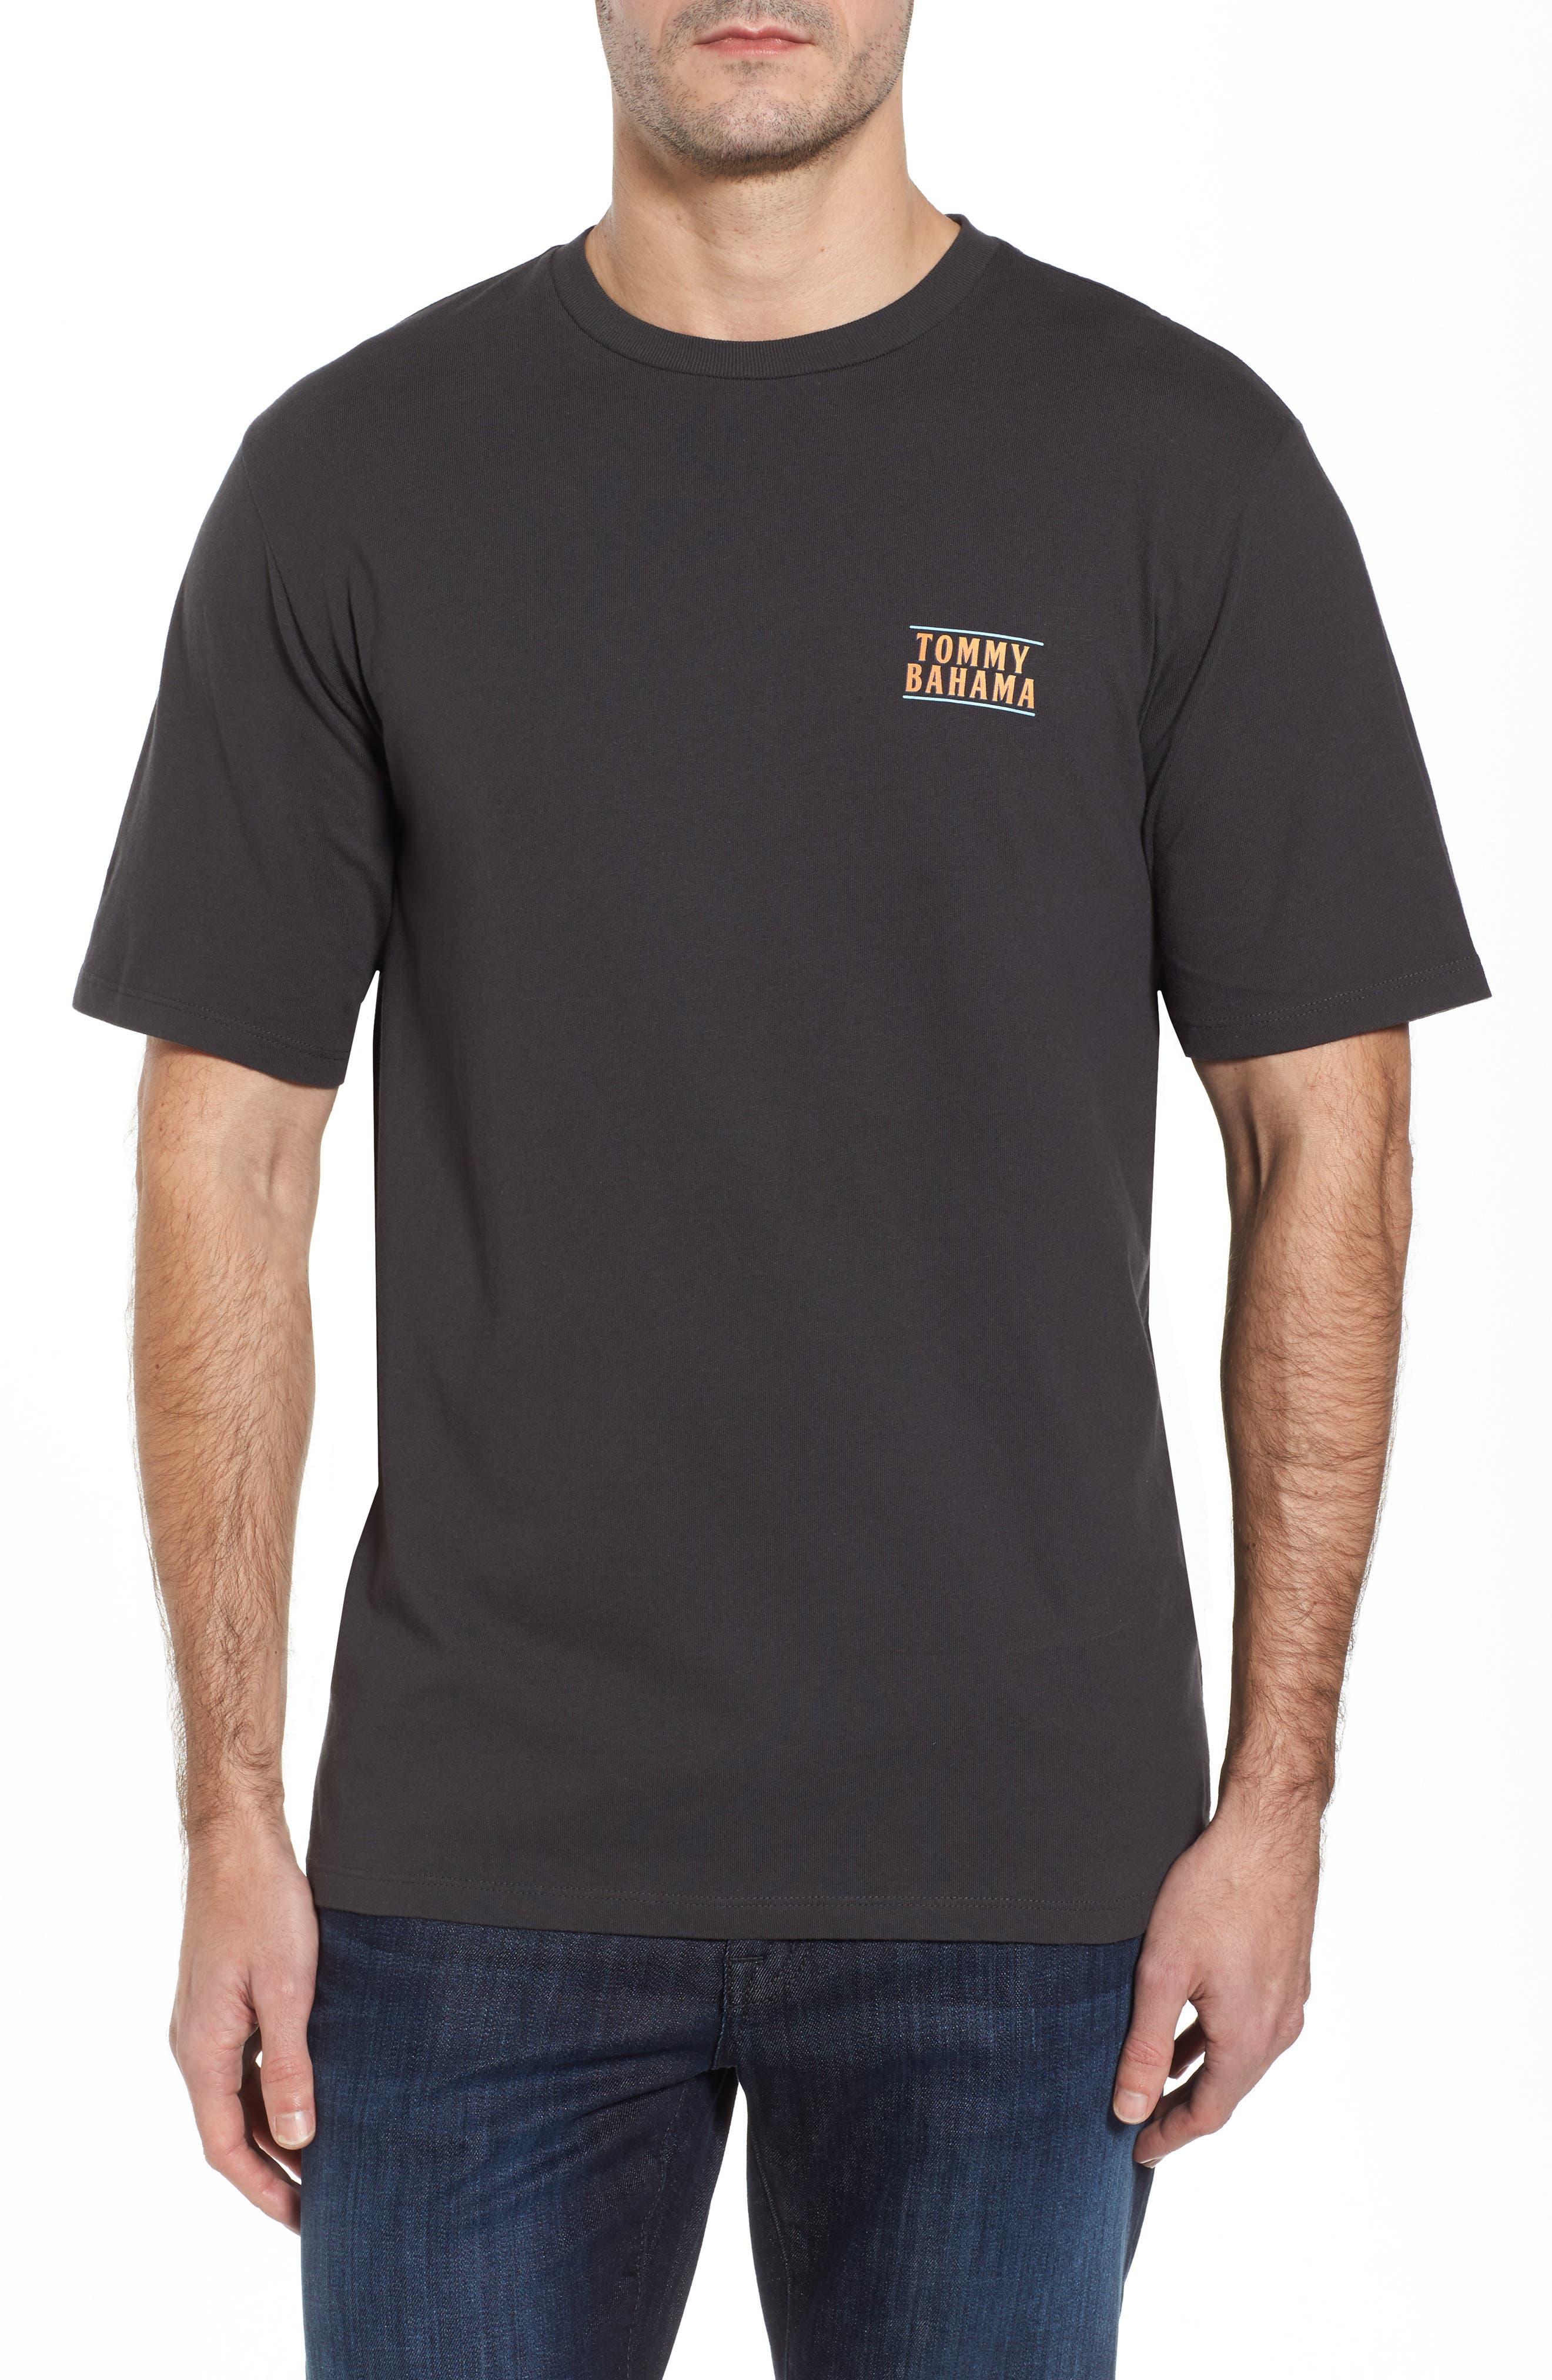 Latest Posts T-Shirt,                             Main thumbnail 1, color,                             001